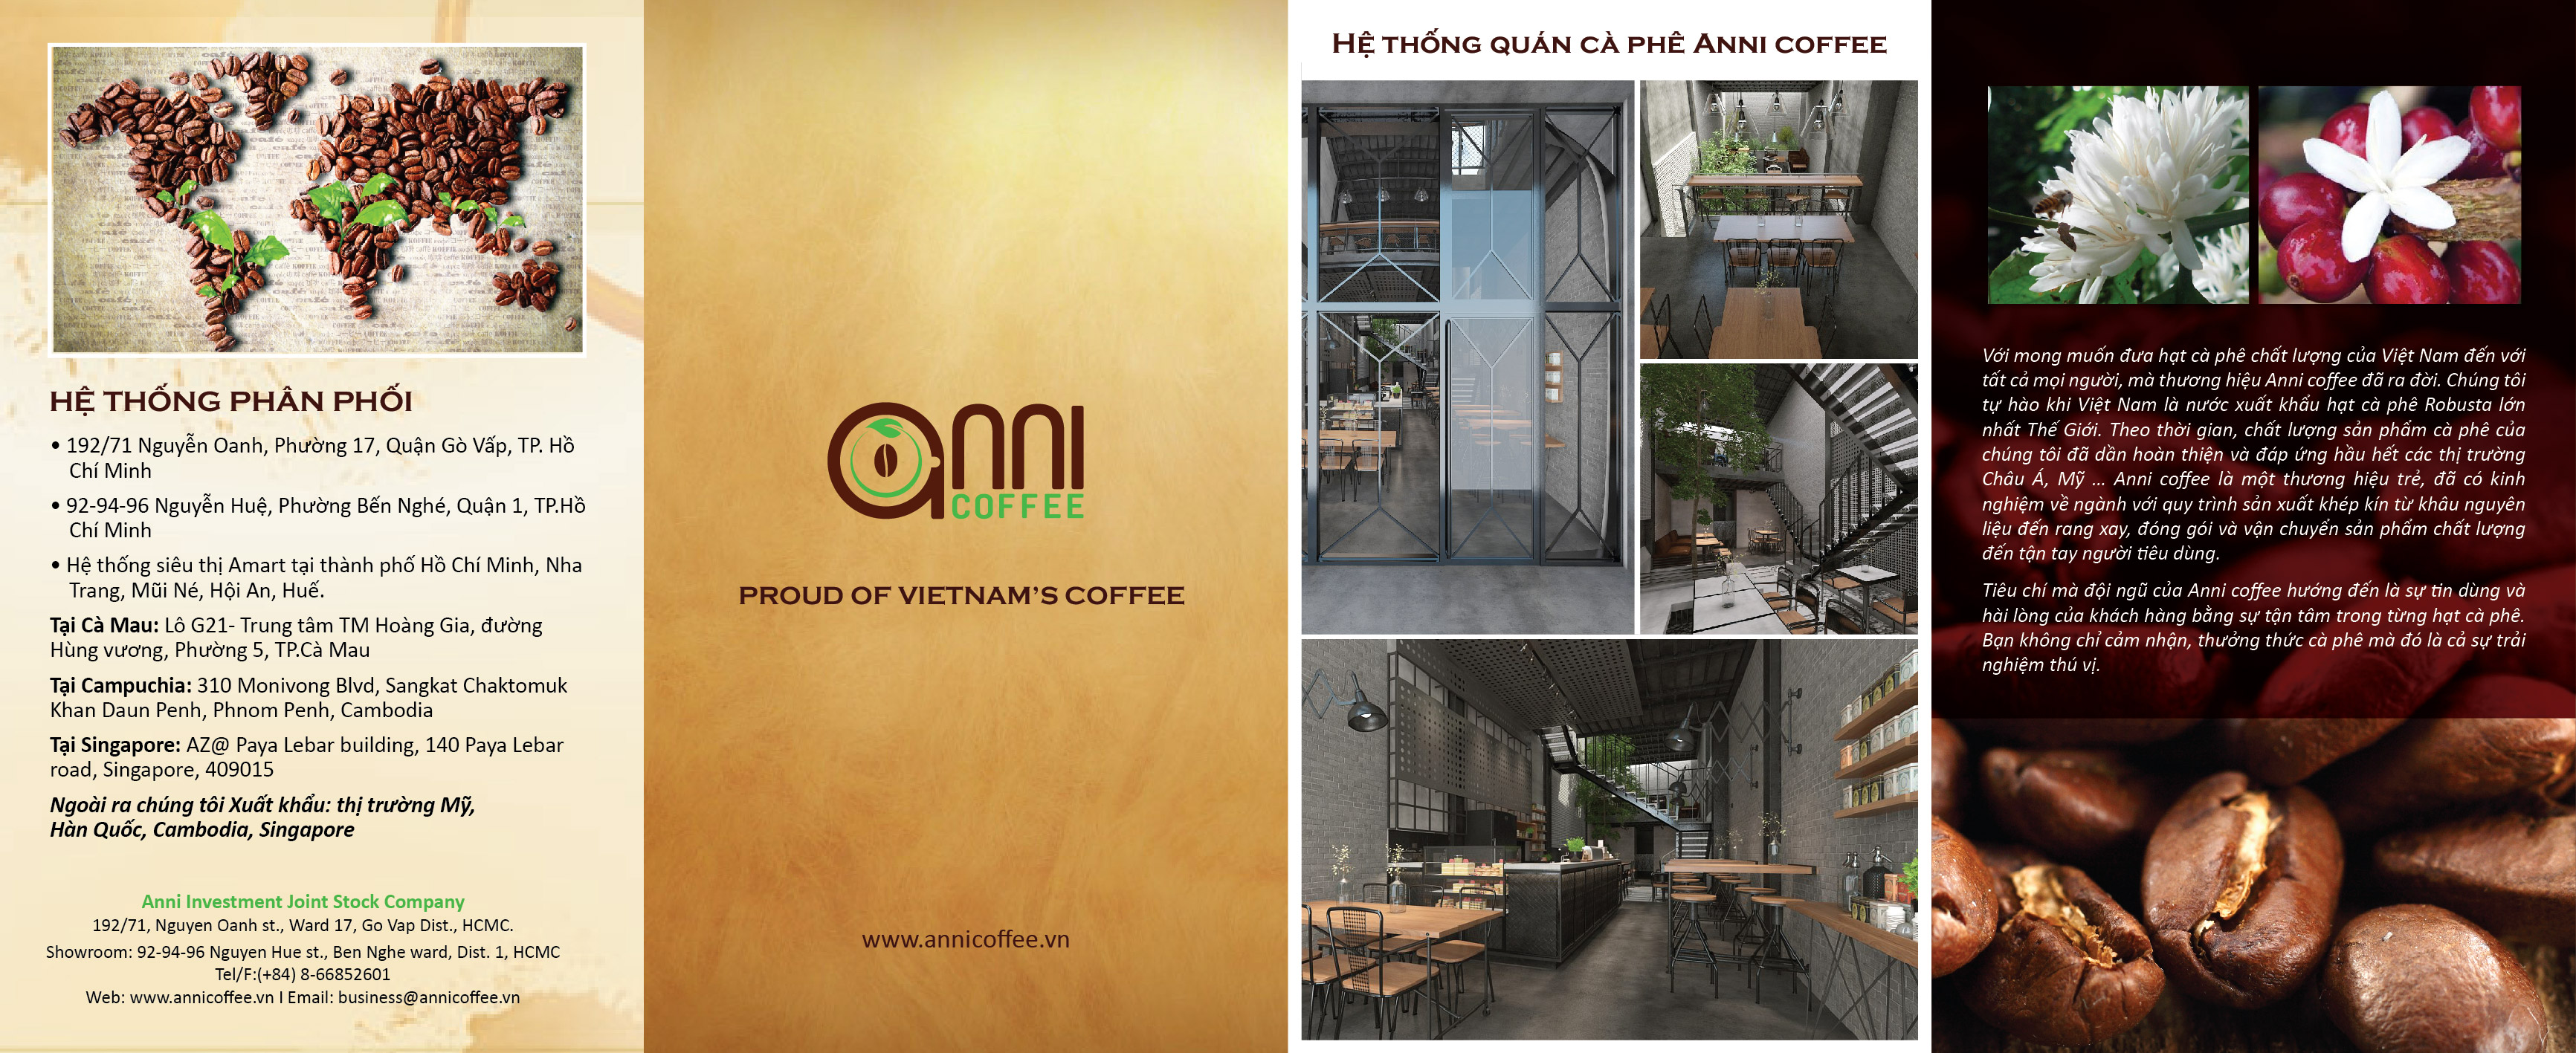 Giới thiệu về Anni Coffee